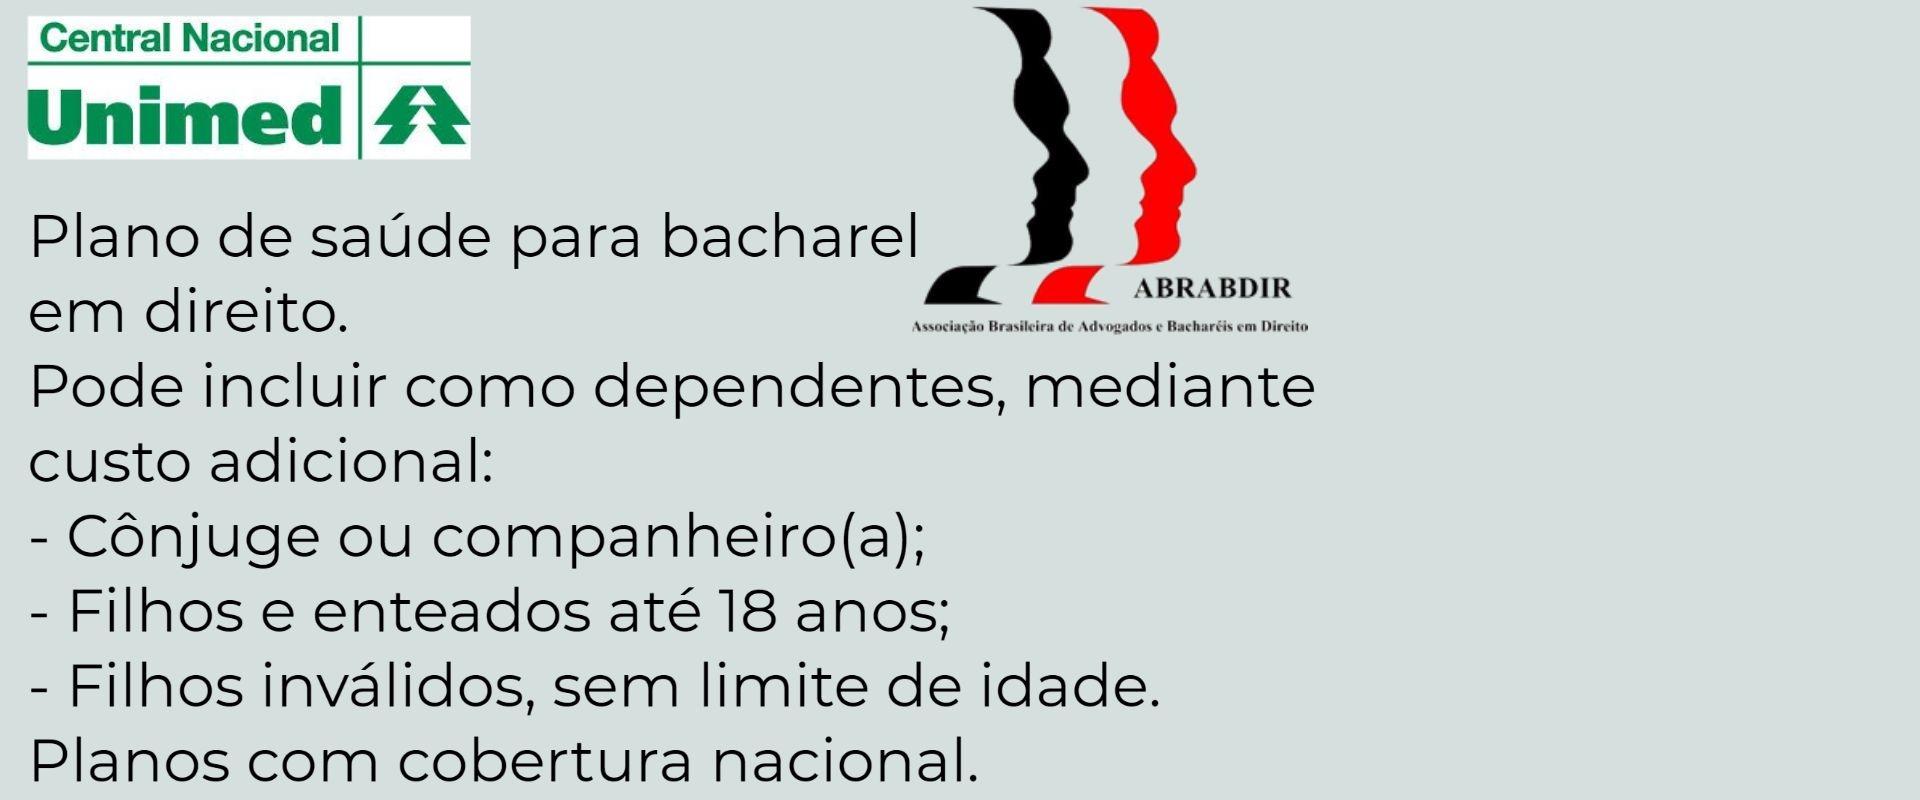 Unimed ABRABDIR Rio Claro